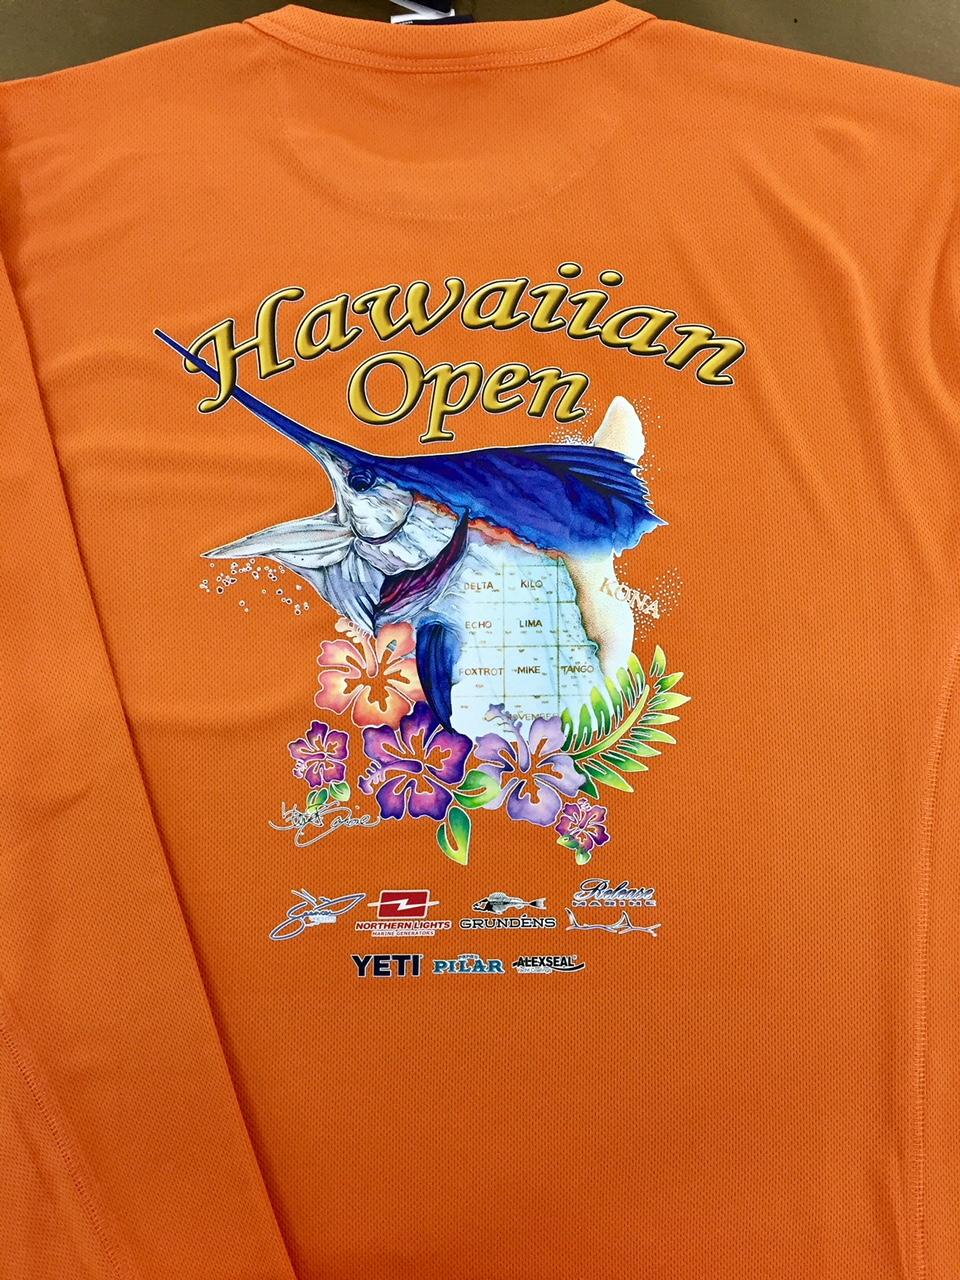 logounltd_laser_etching_embroidery_screen_printing_corporate_apparel_uniform_custom_tshirts_uniforms_dye_sublimation_kirkland_bellevue_seattle_redmond_branded_merchandise_promotional_products_logo_untd (75).jpg